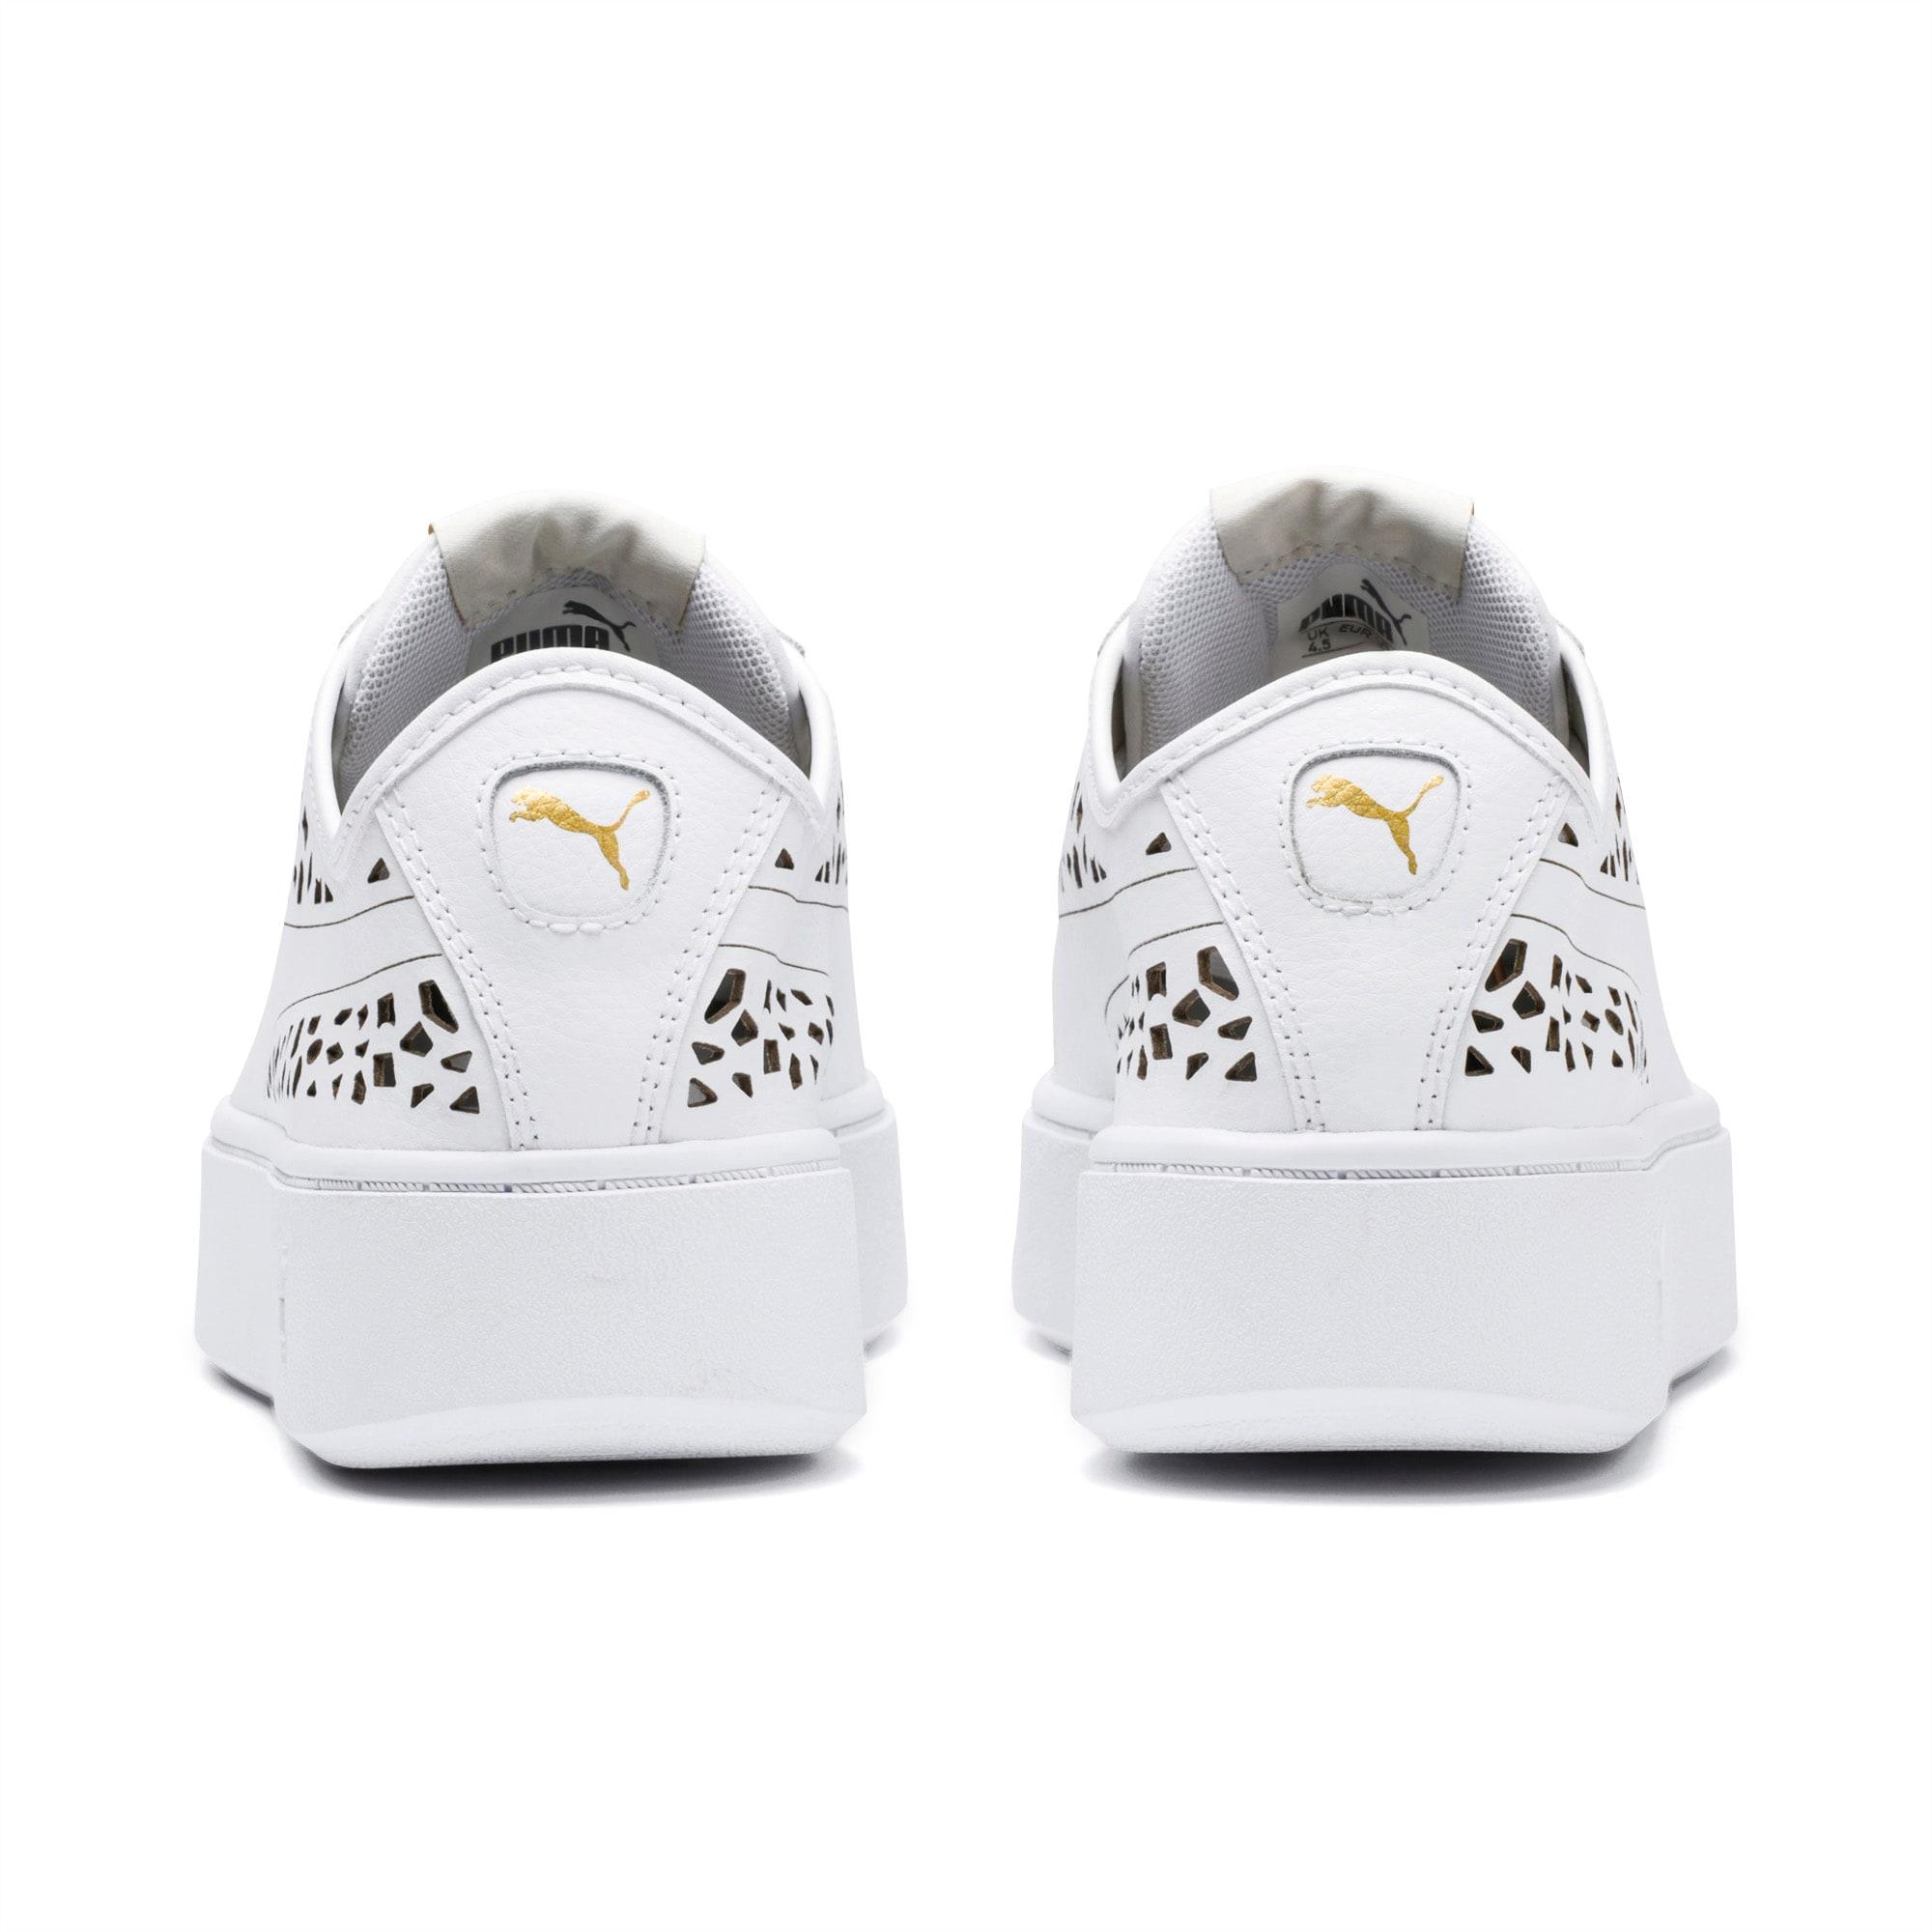 Vikky Stacked Laser Cut Damen Sneaker | Puma White Puma